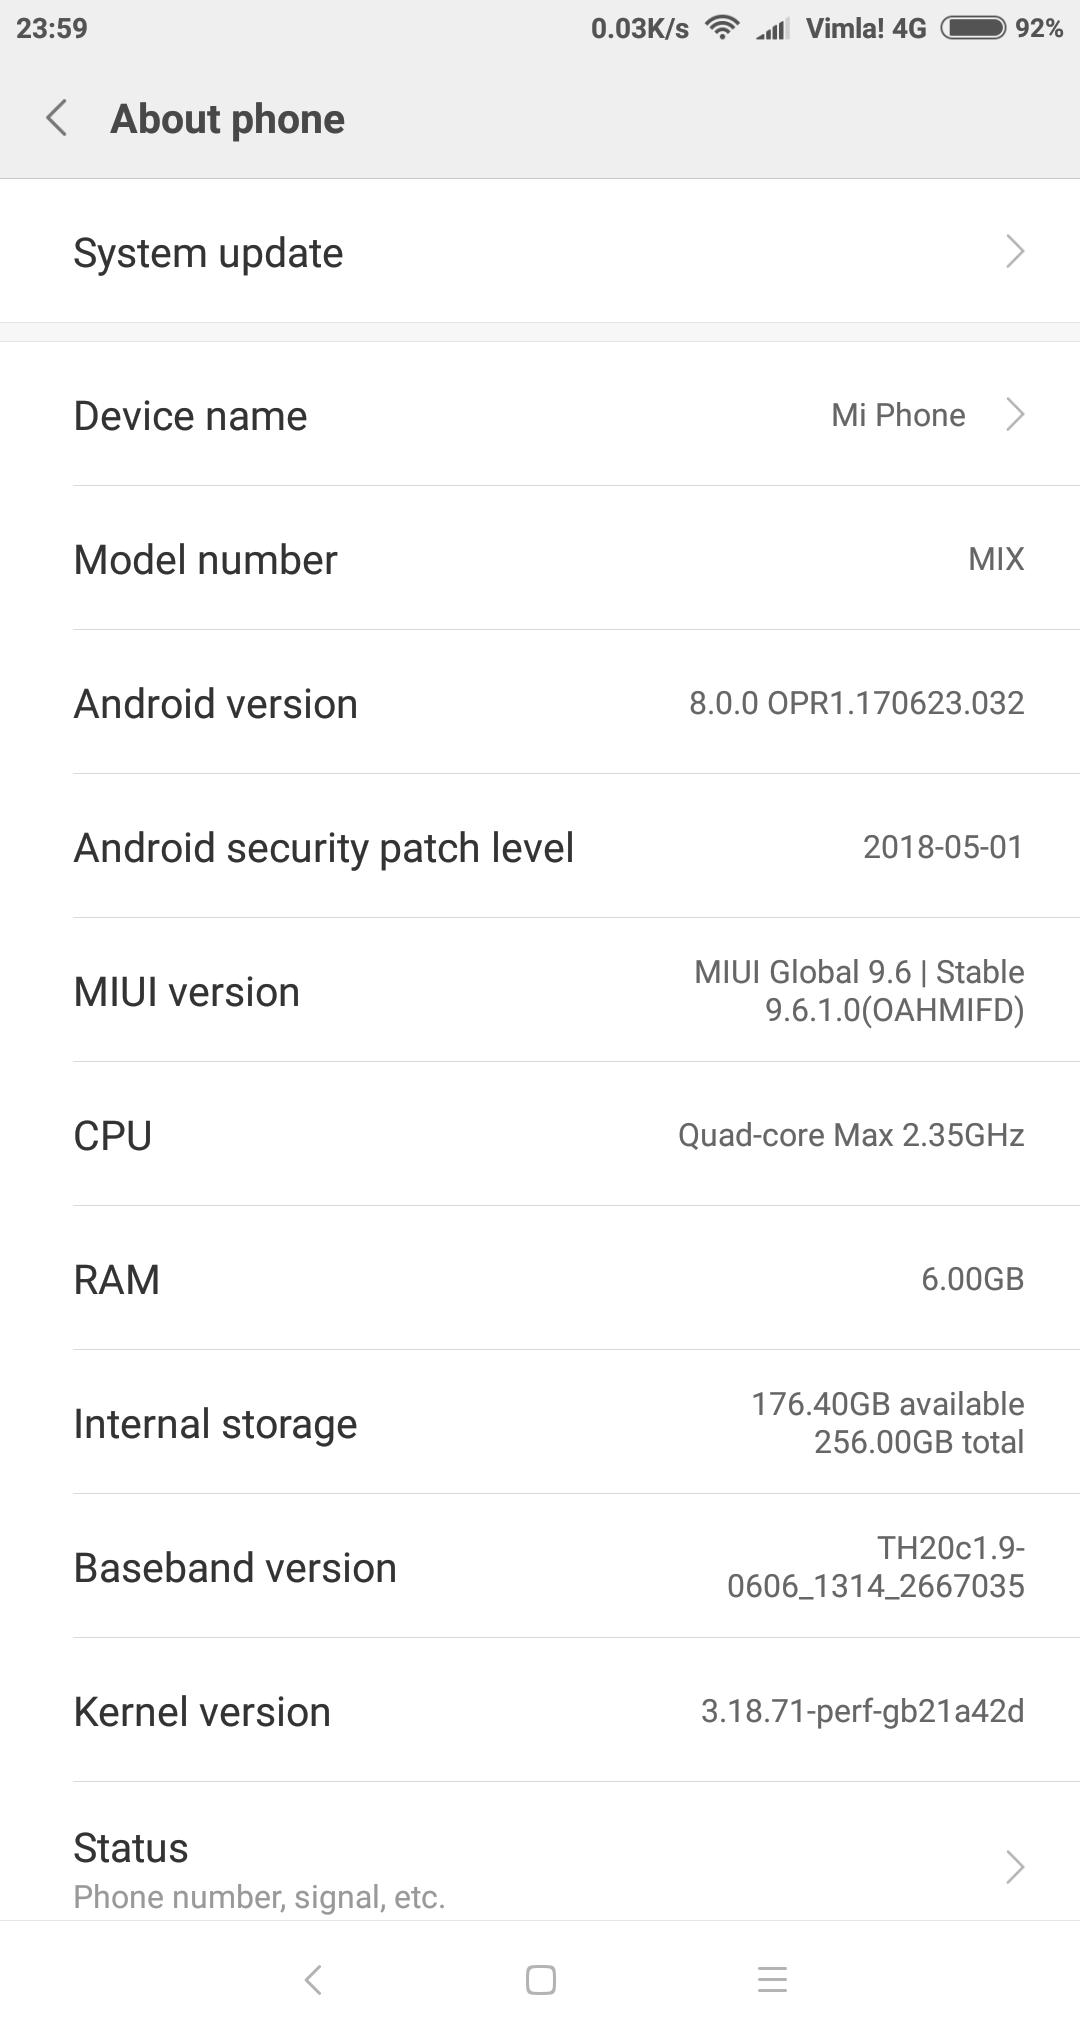 Screenshot_2018-07-12-23-59-00-133_com.android.settings.png